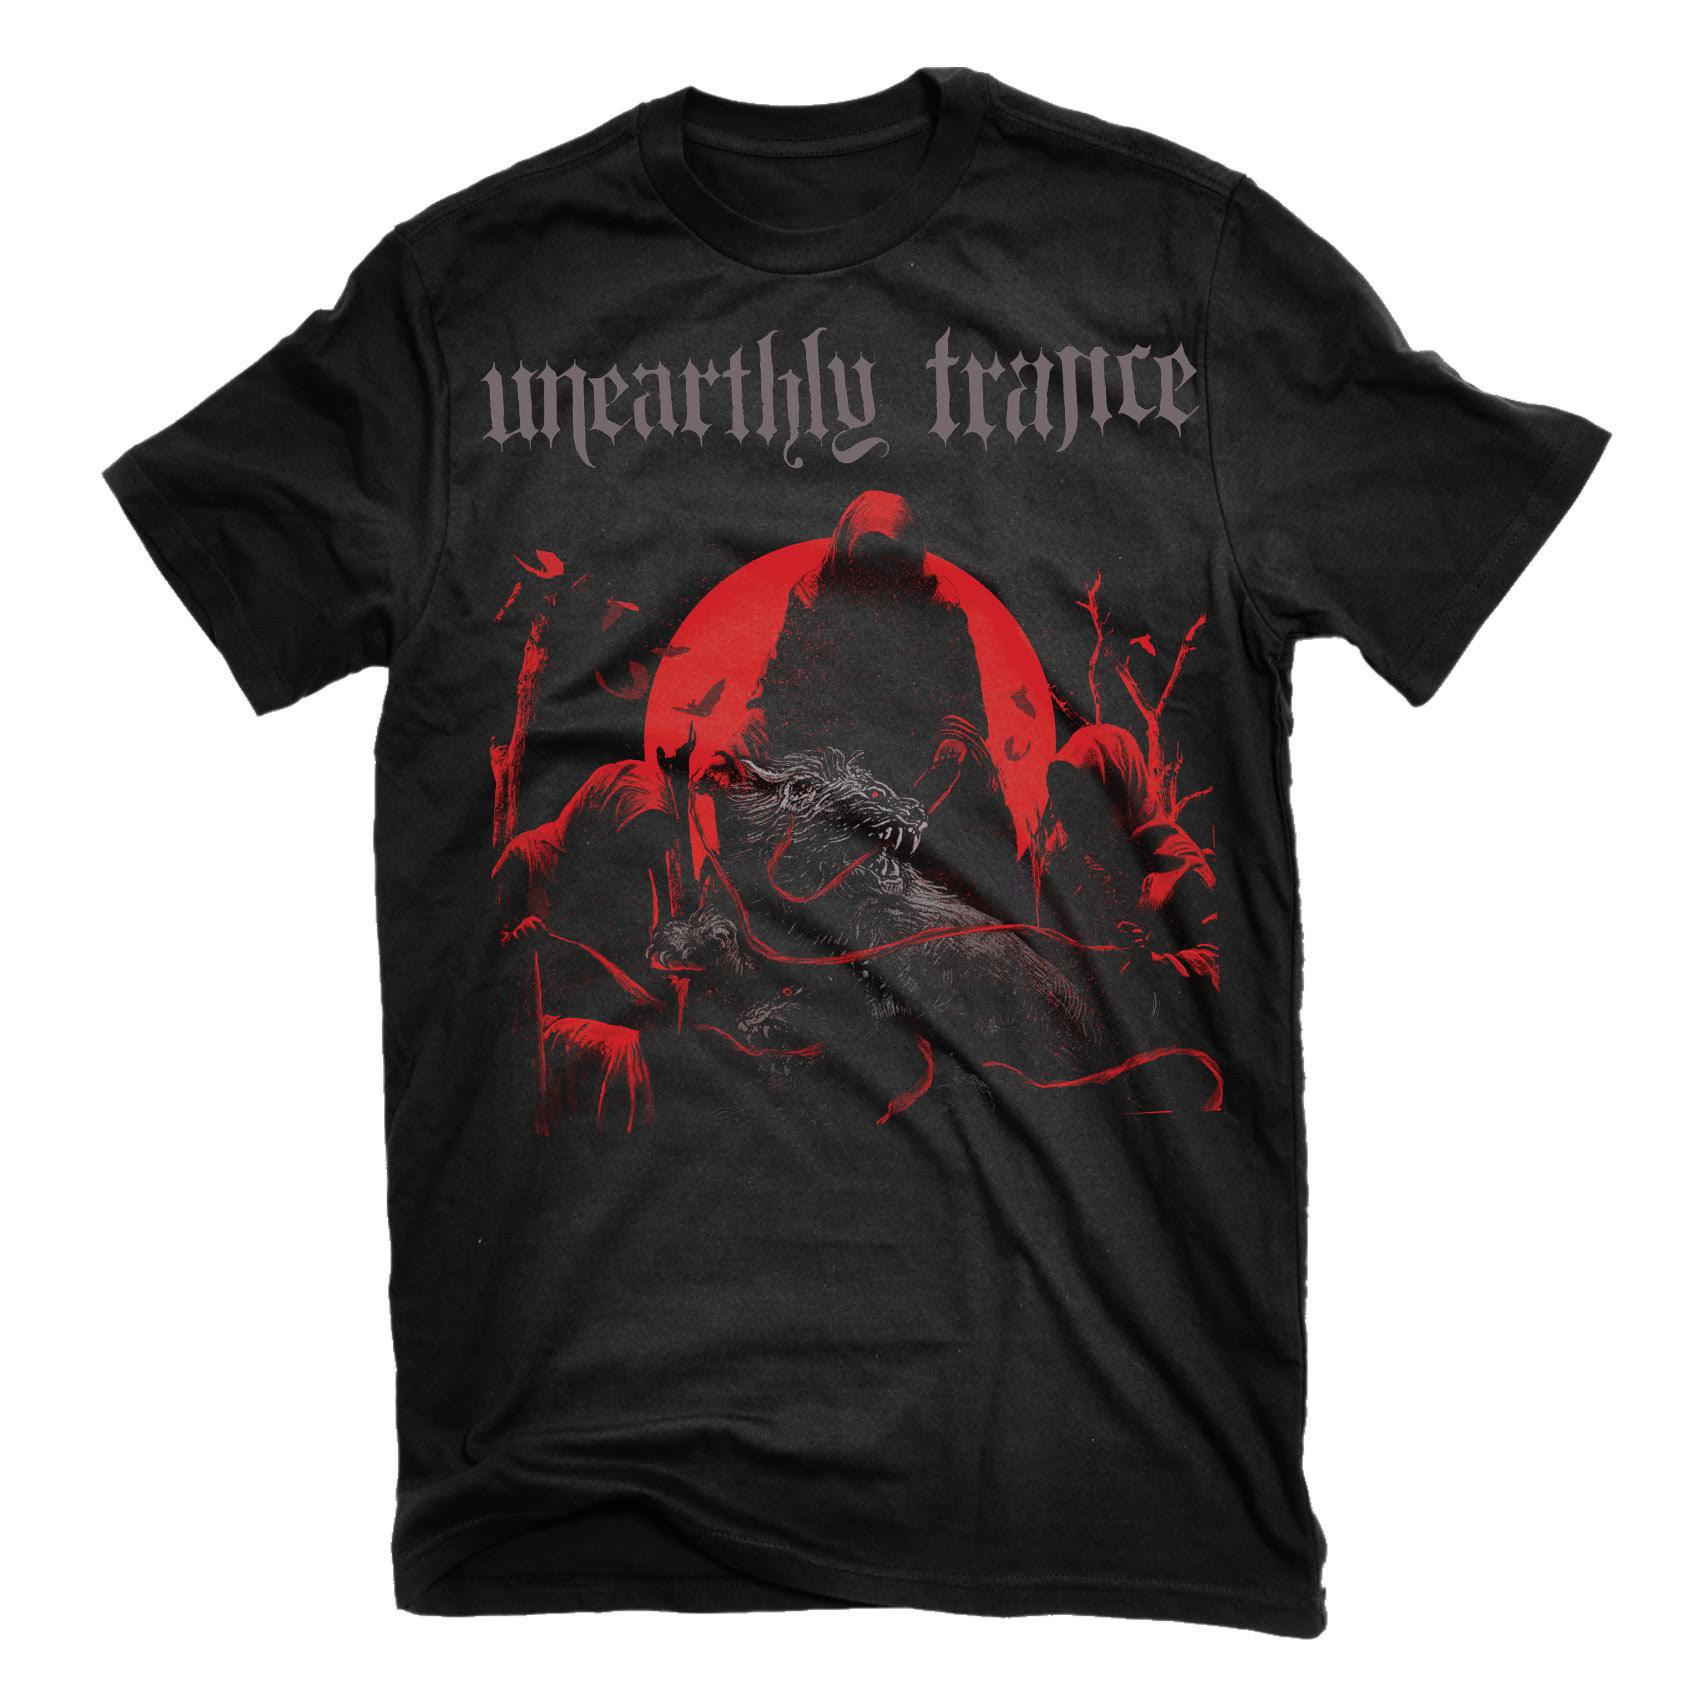 Stalking The Ghost T Shirt + LP Bundle